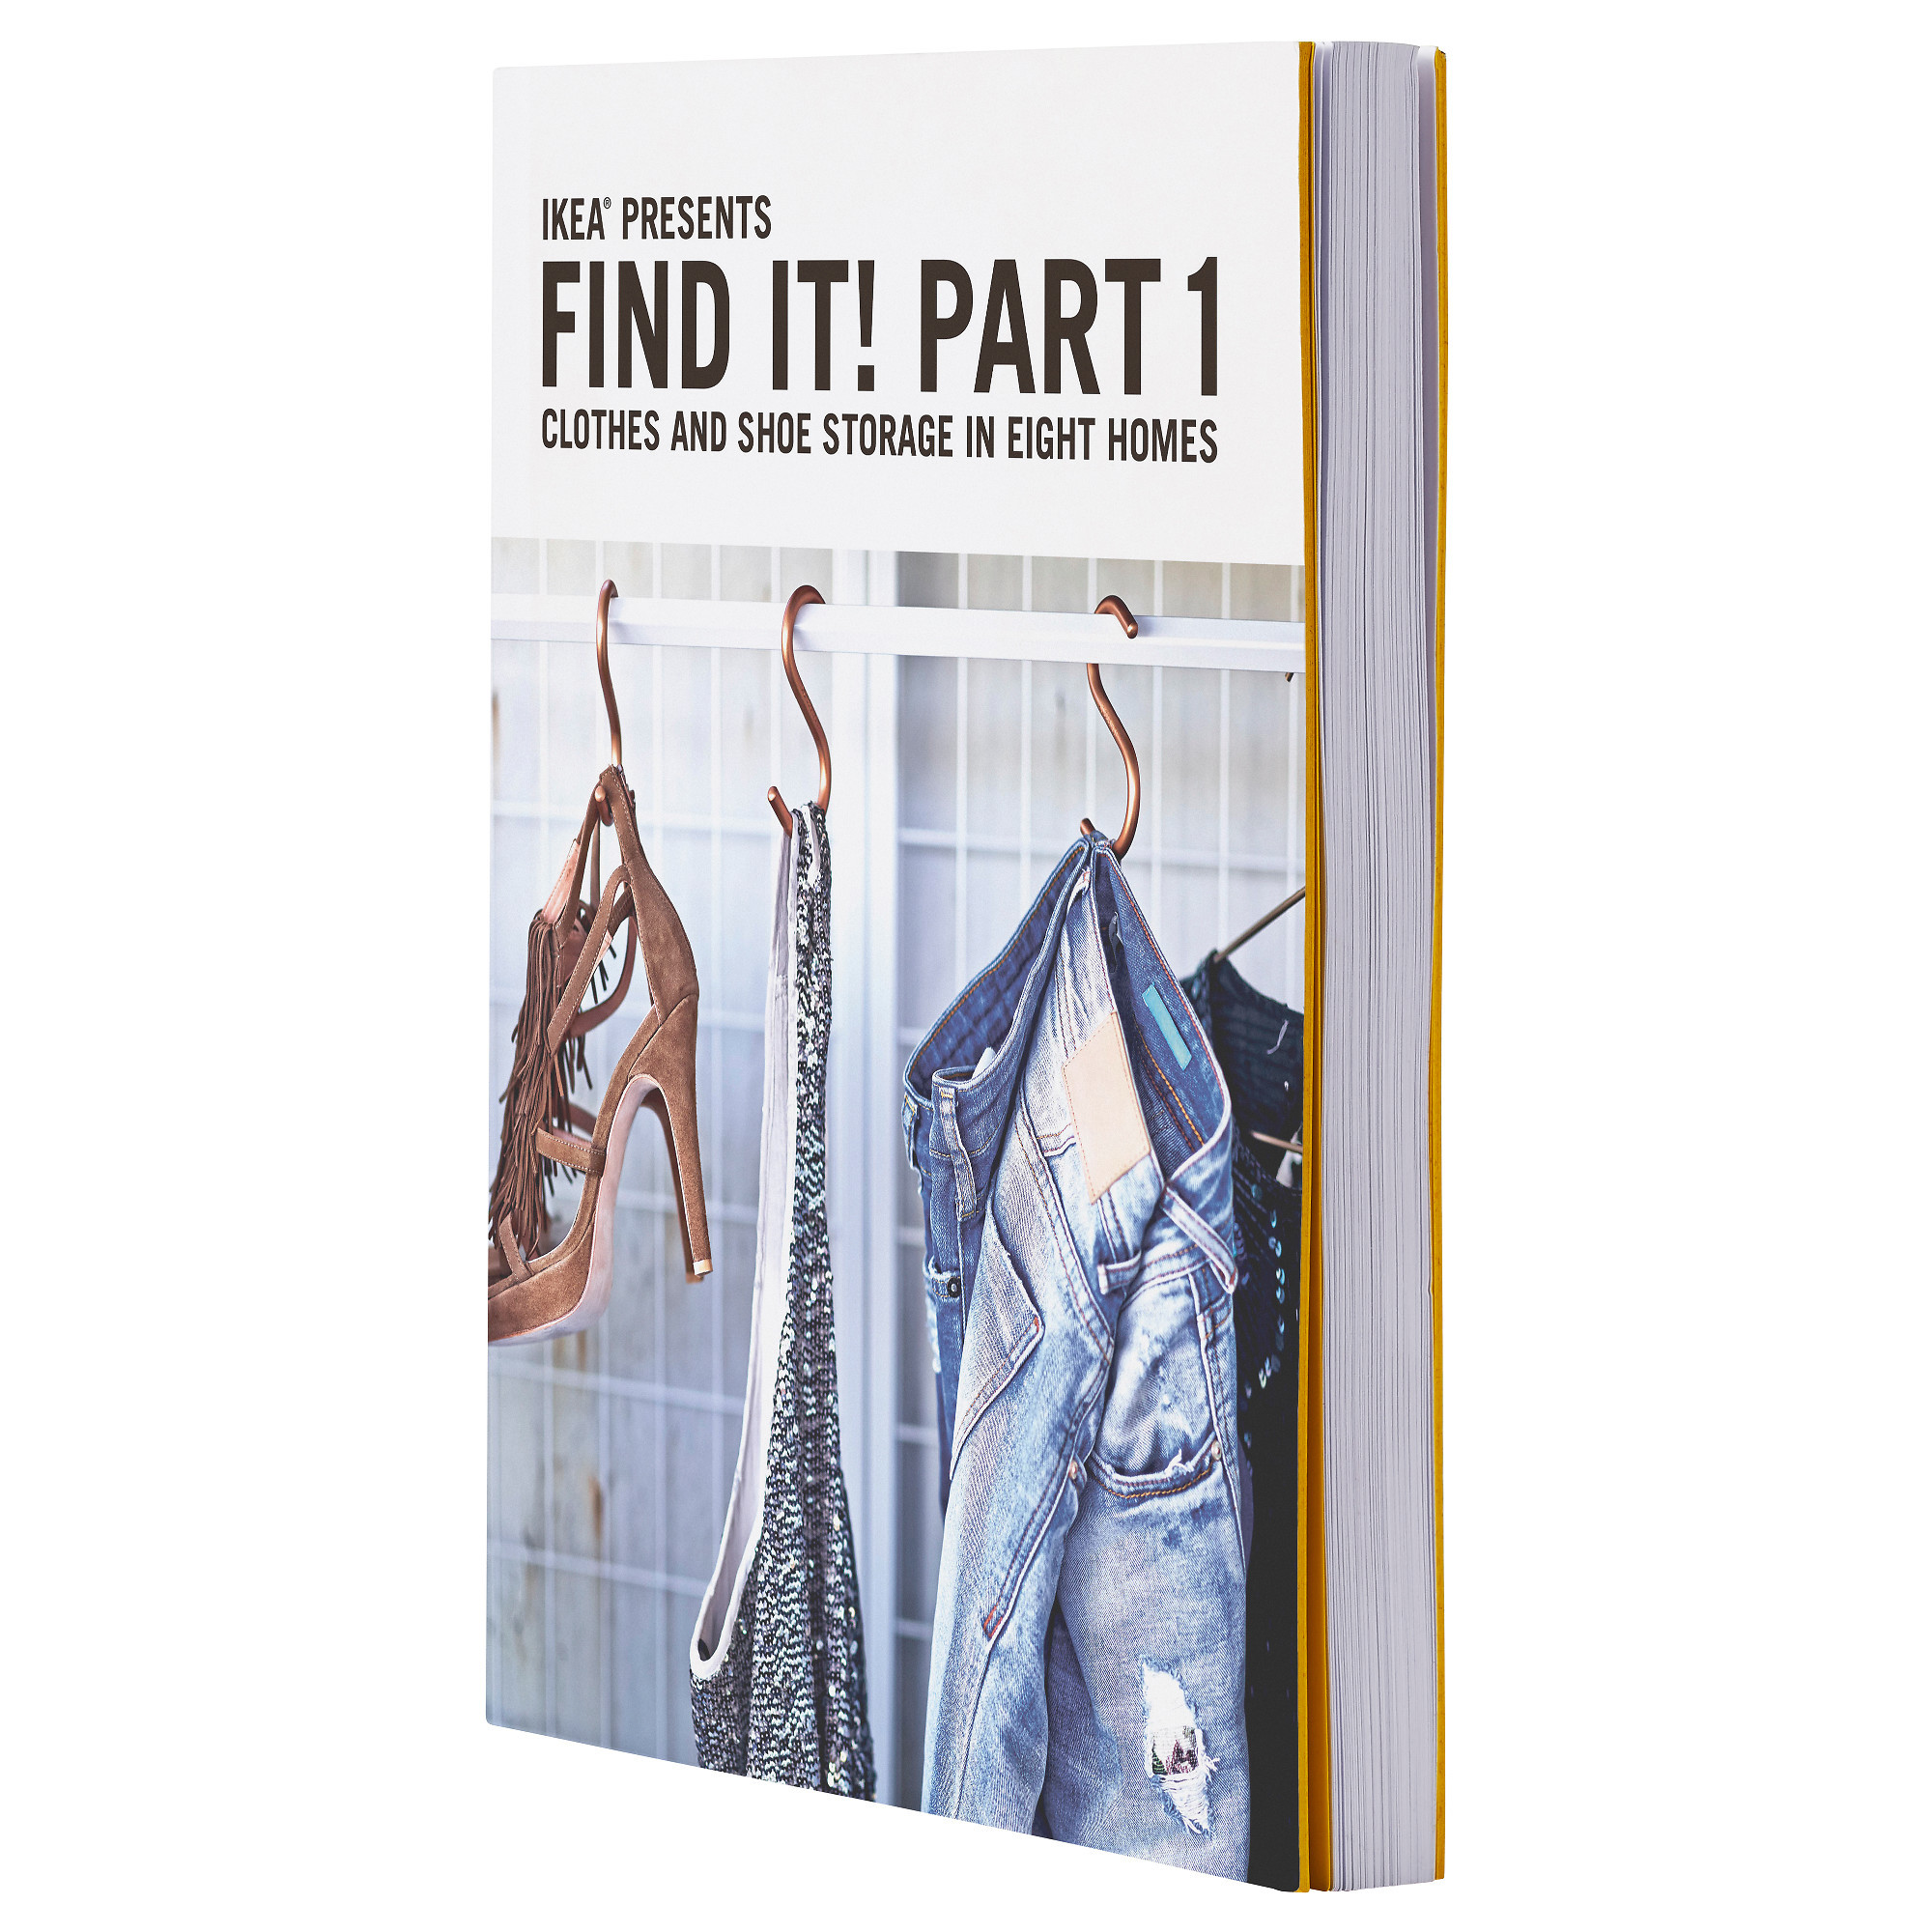 Ikea Presents Find It Part 1 By Stina